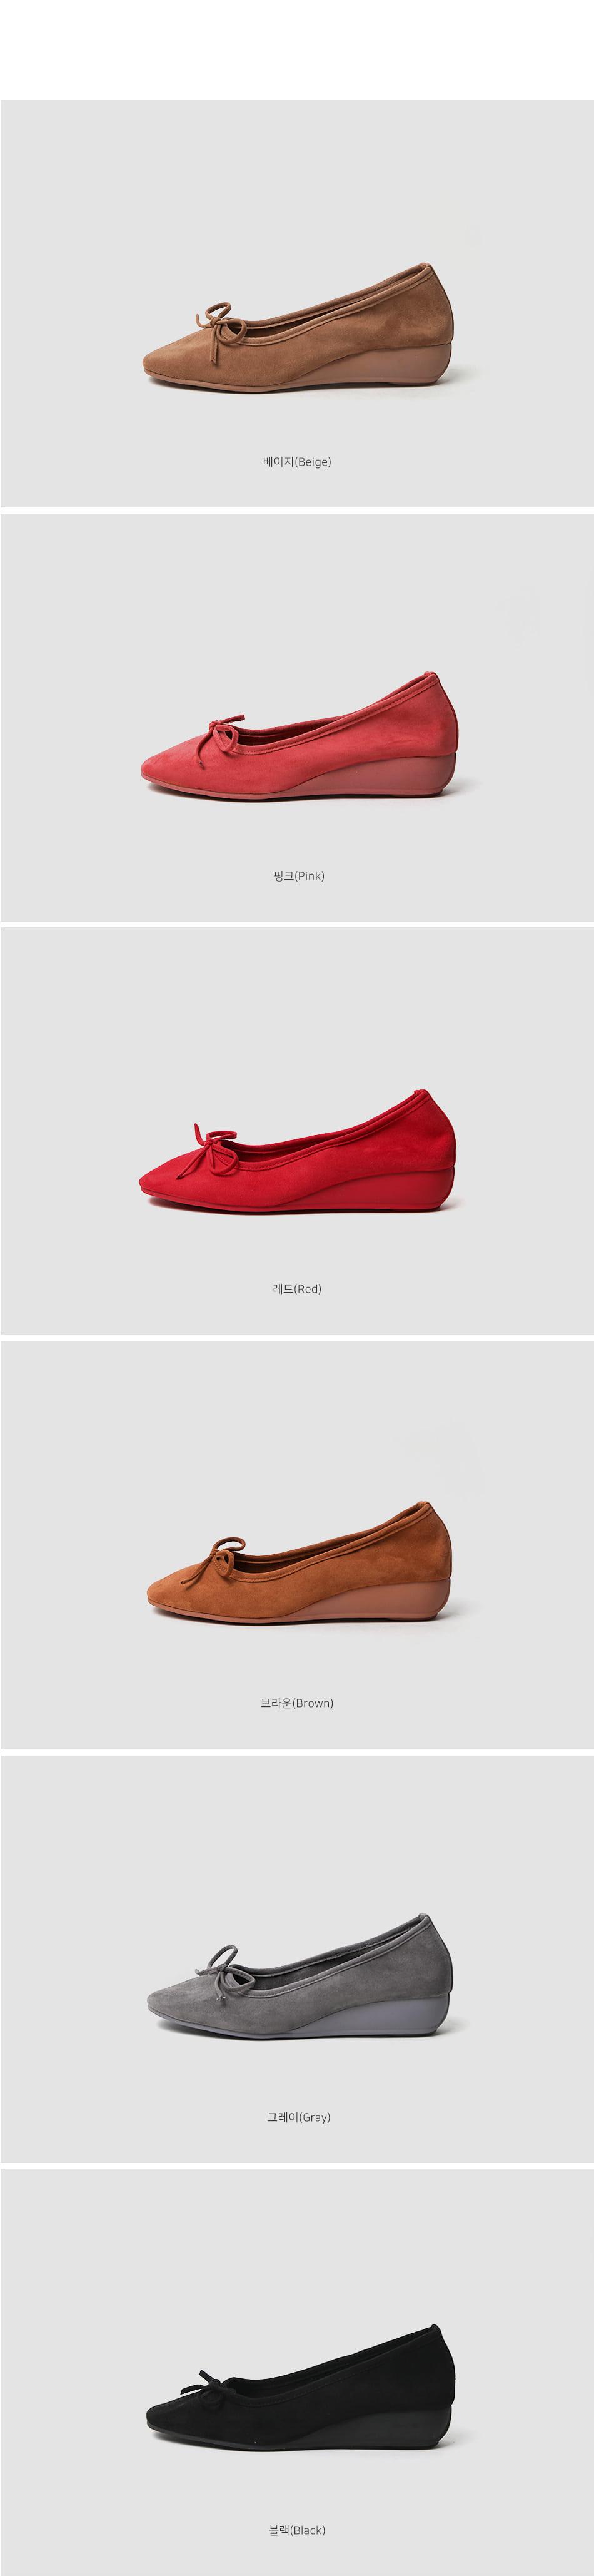 LECAEL Wedge Flat Shoes 3cm